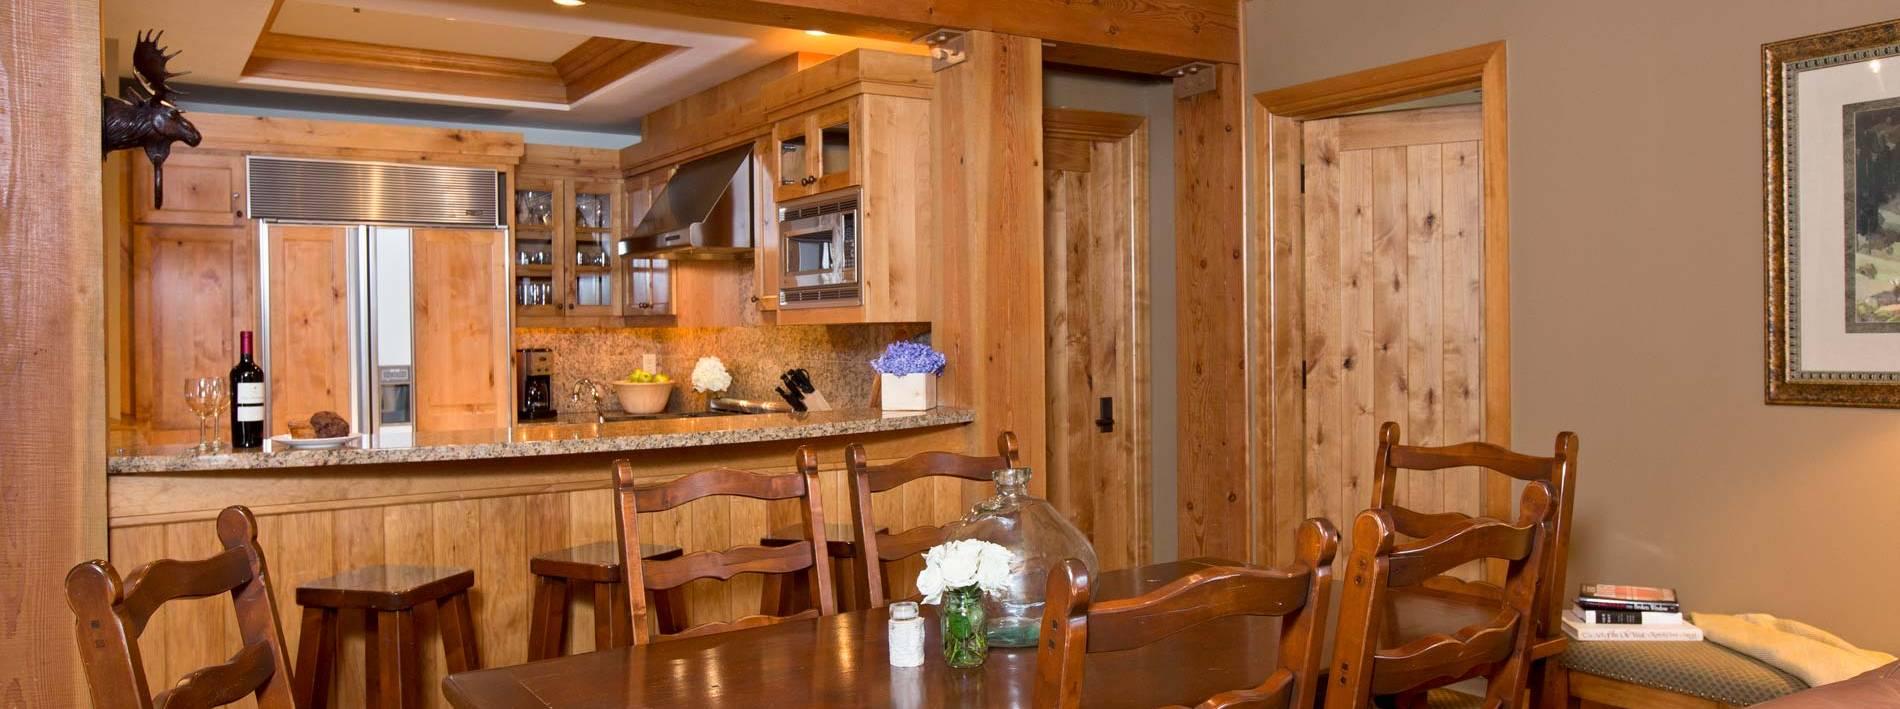 Luxury kitchen in this Teton Village private home rental